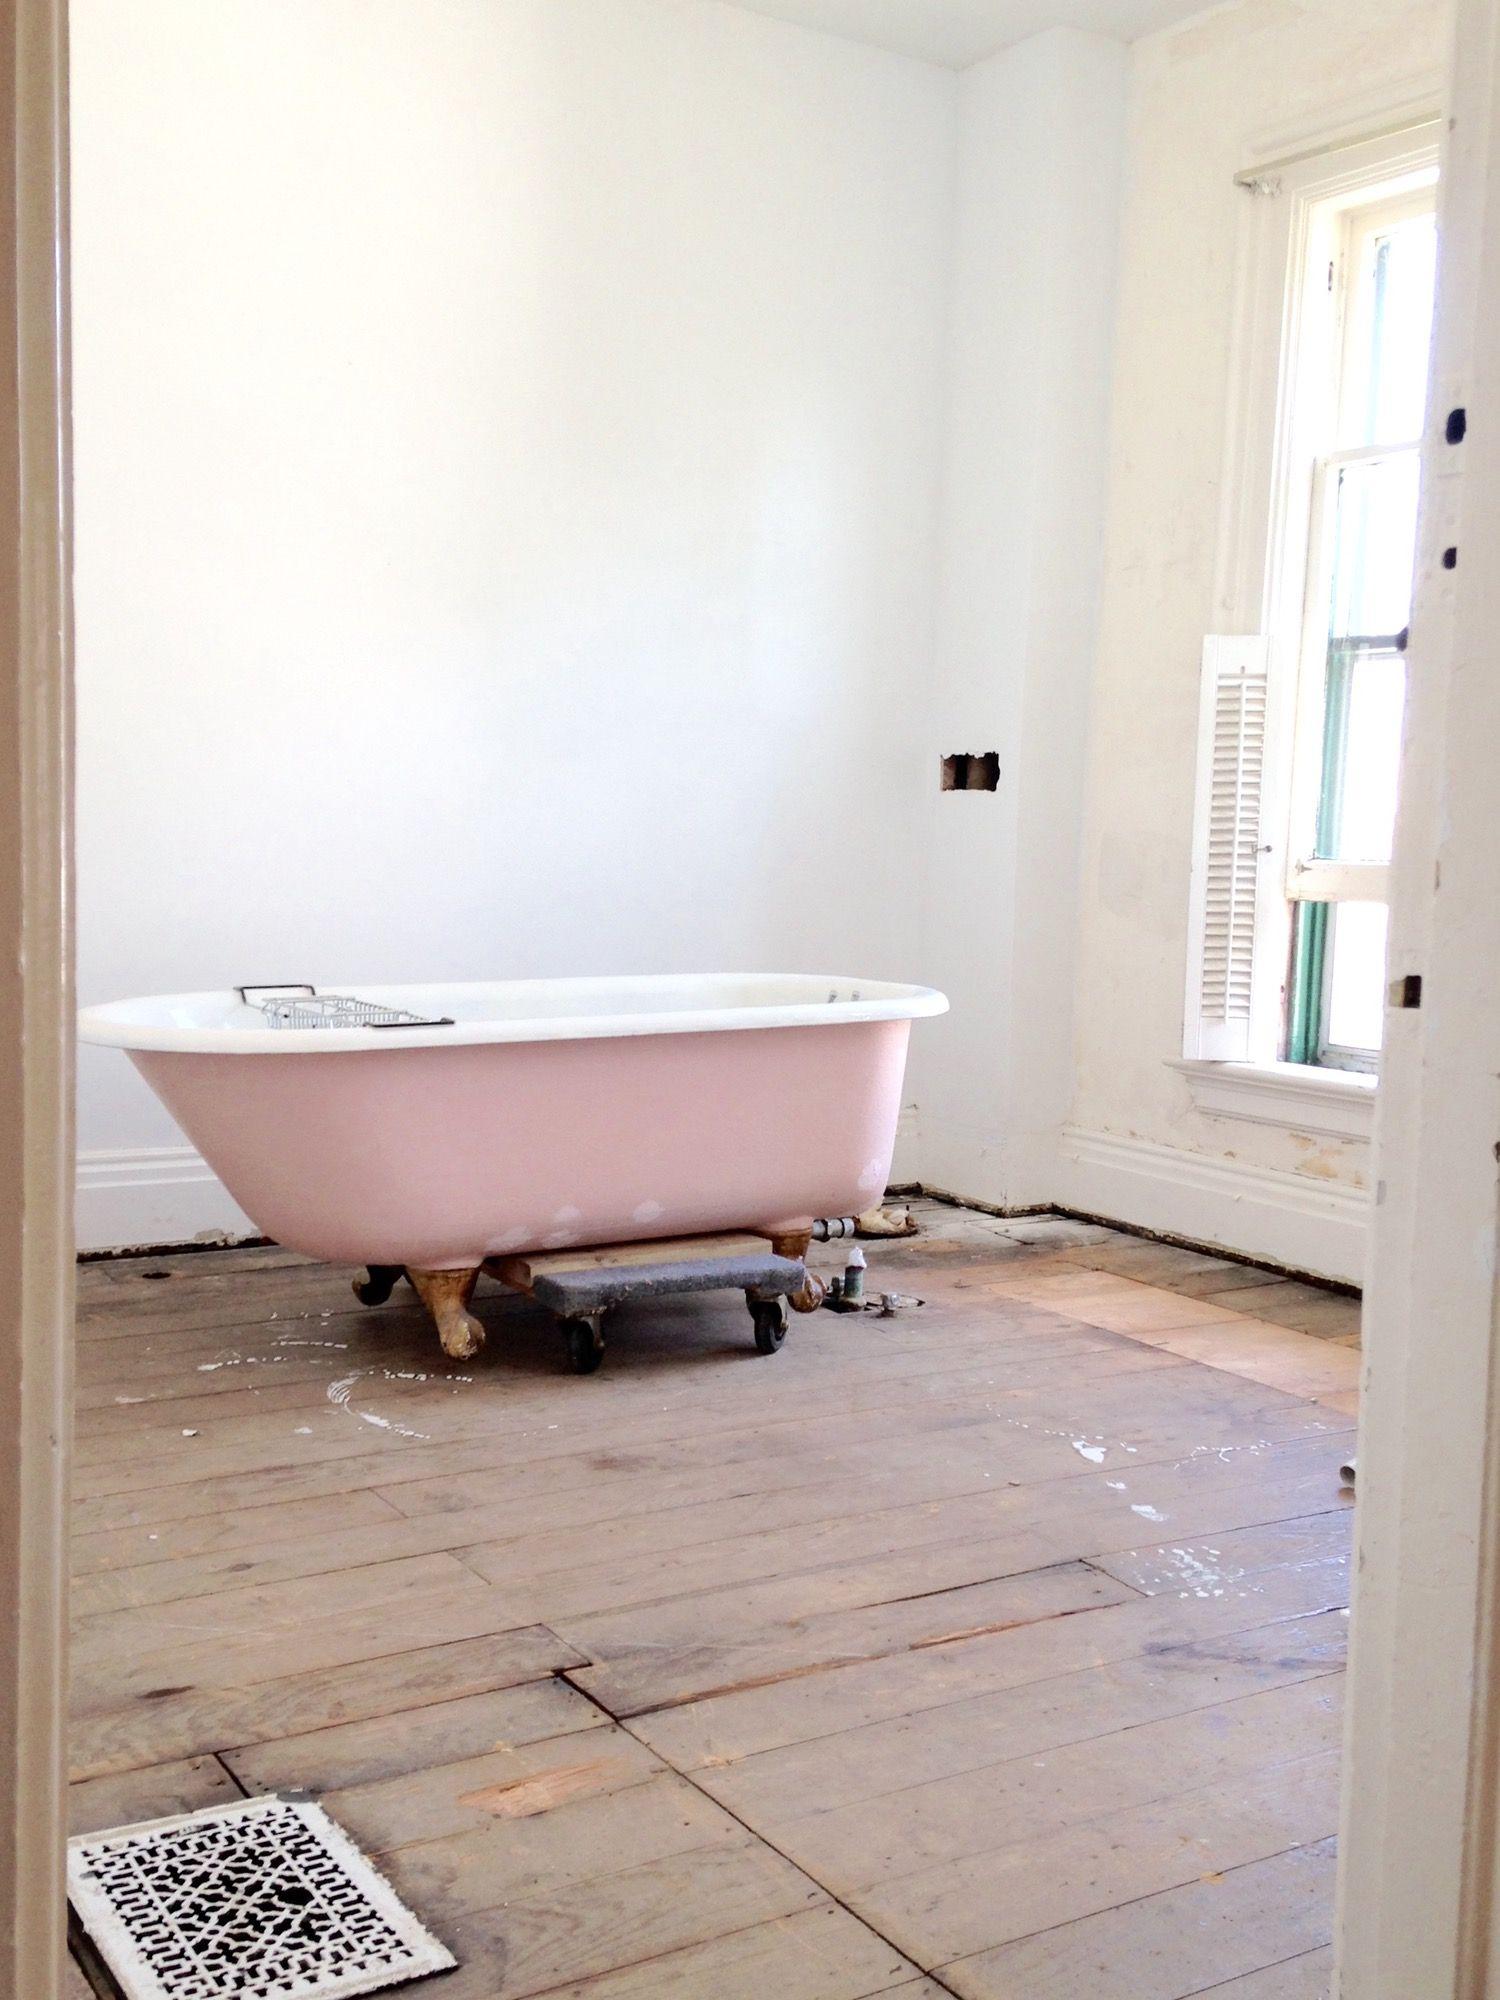 How to Sandblast & Refinish A Vintage Clawfoot Tub | Cast iron tub ...